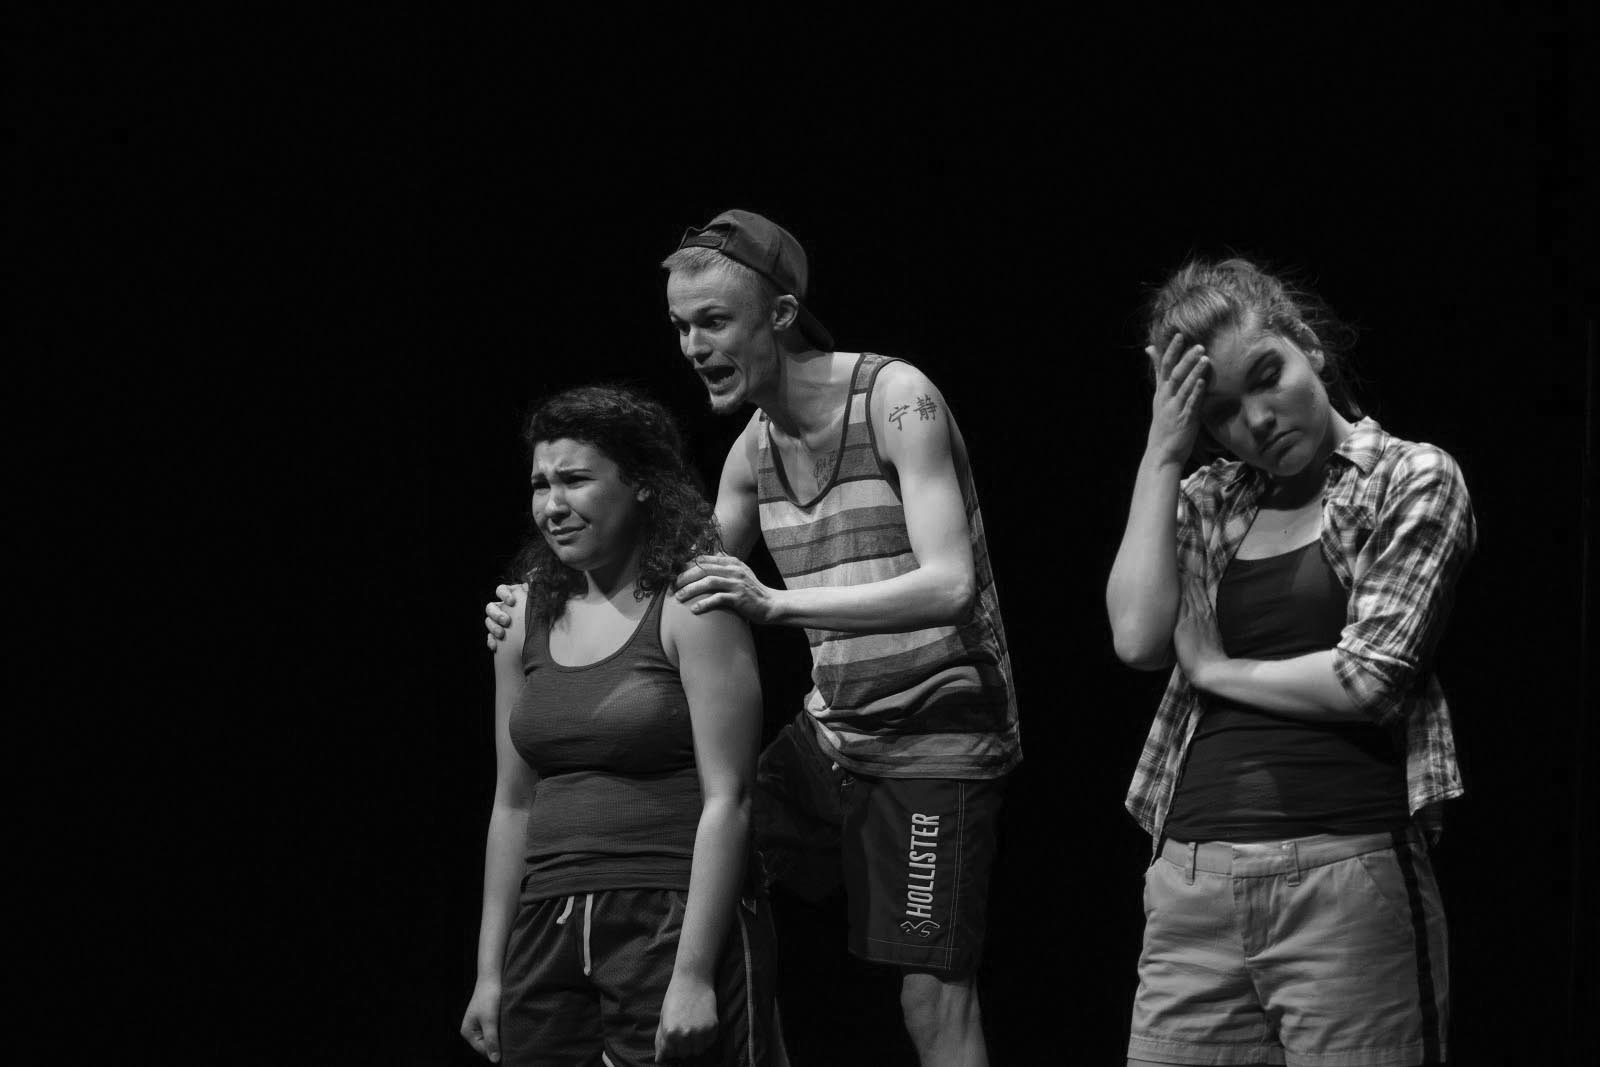 Christina Hofer, Ally Medellin and James Lang rehearse in Umble Center